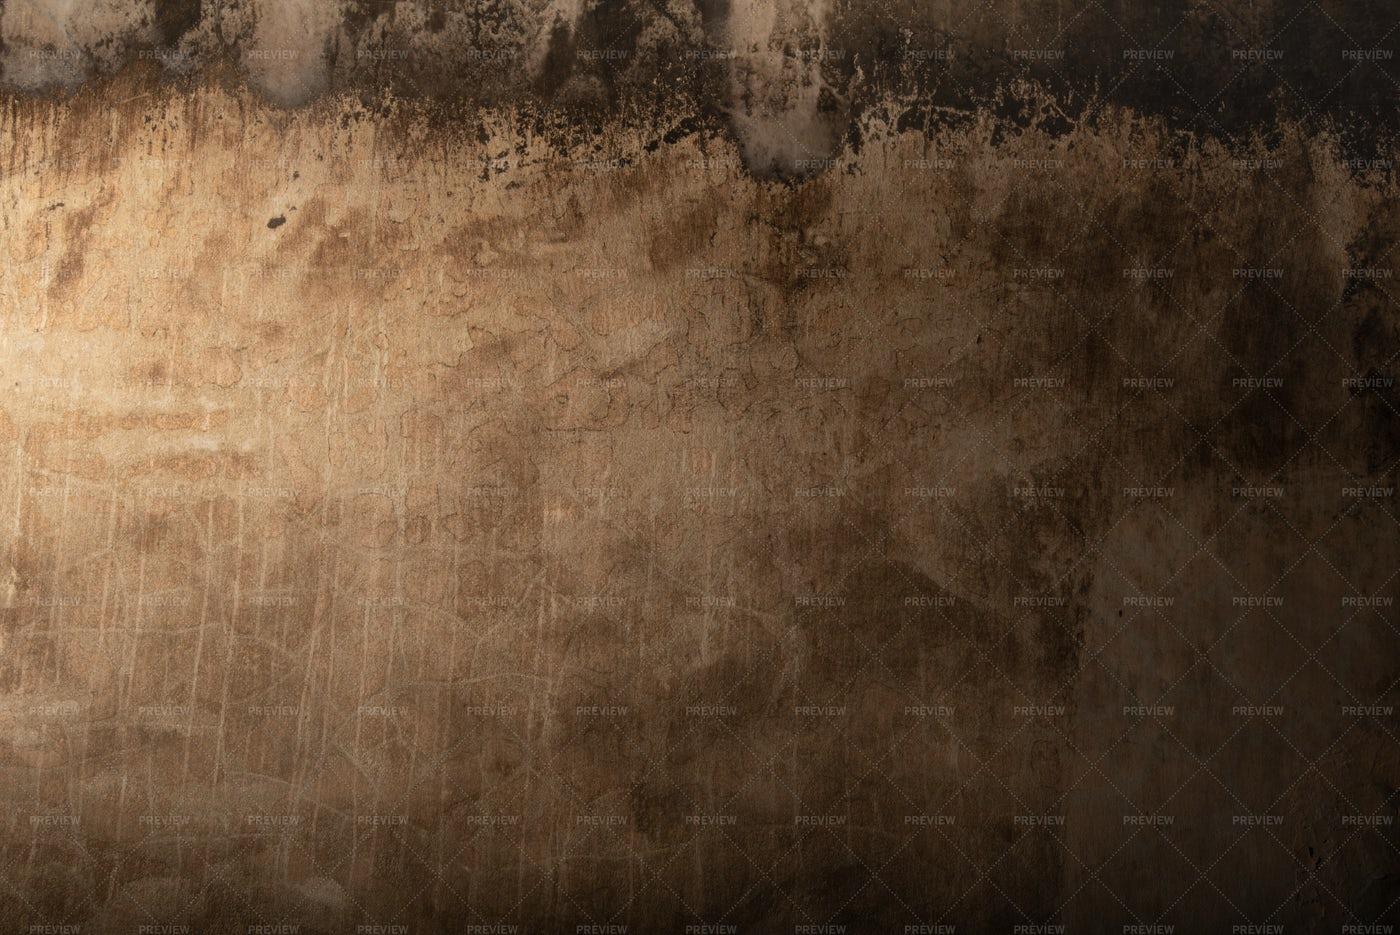 Rusty Wall Texture: Stock Photos